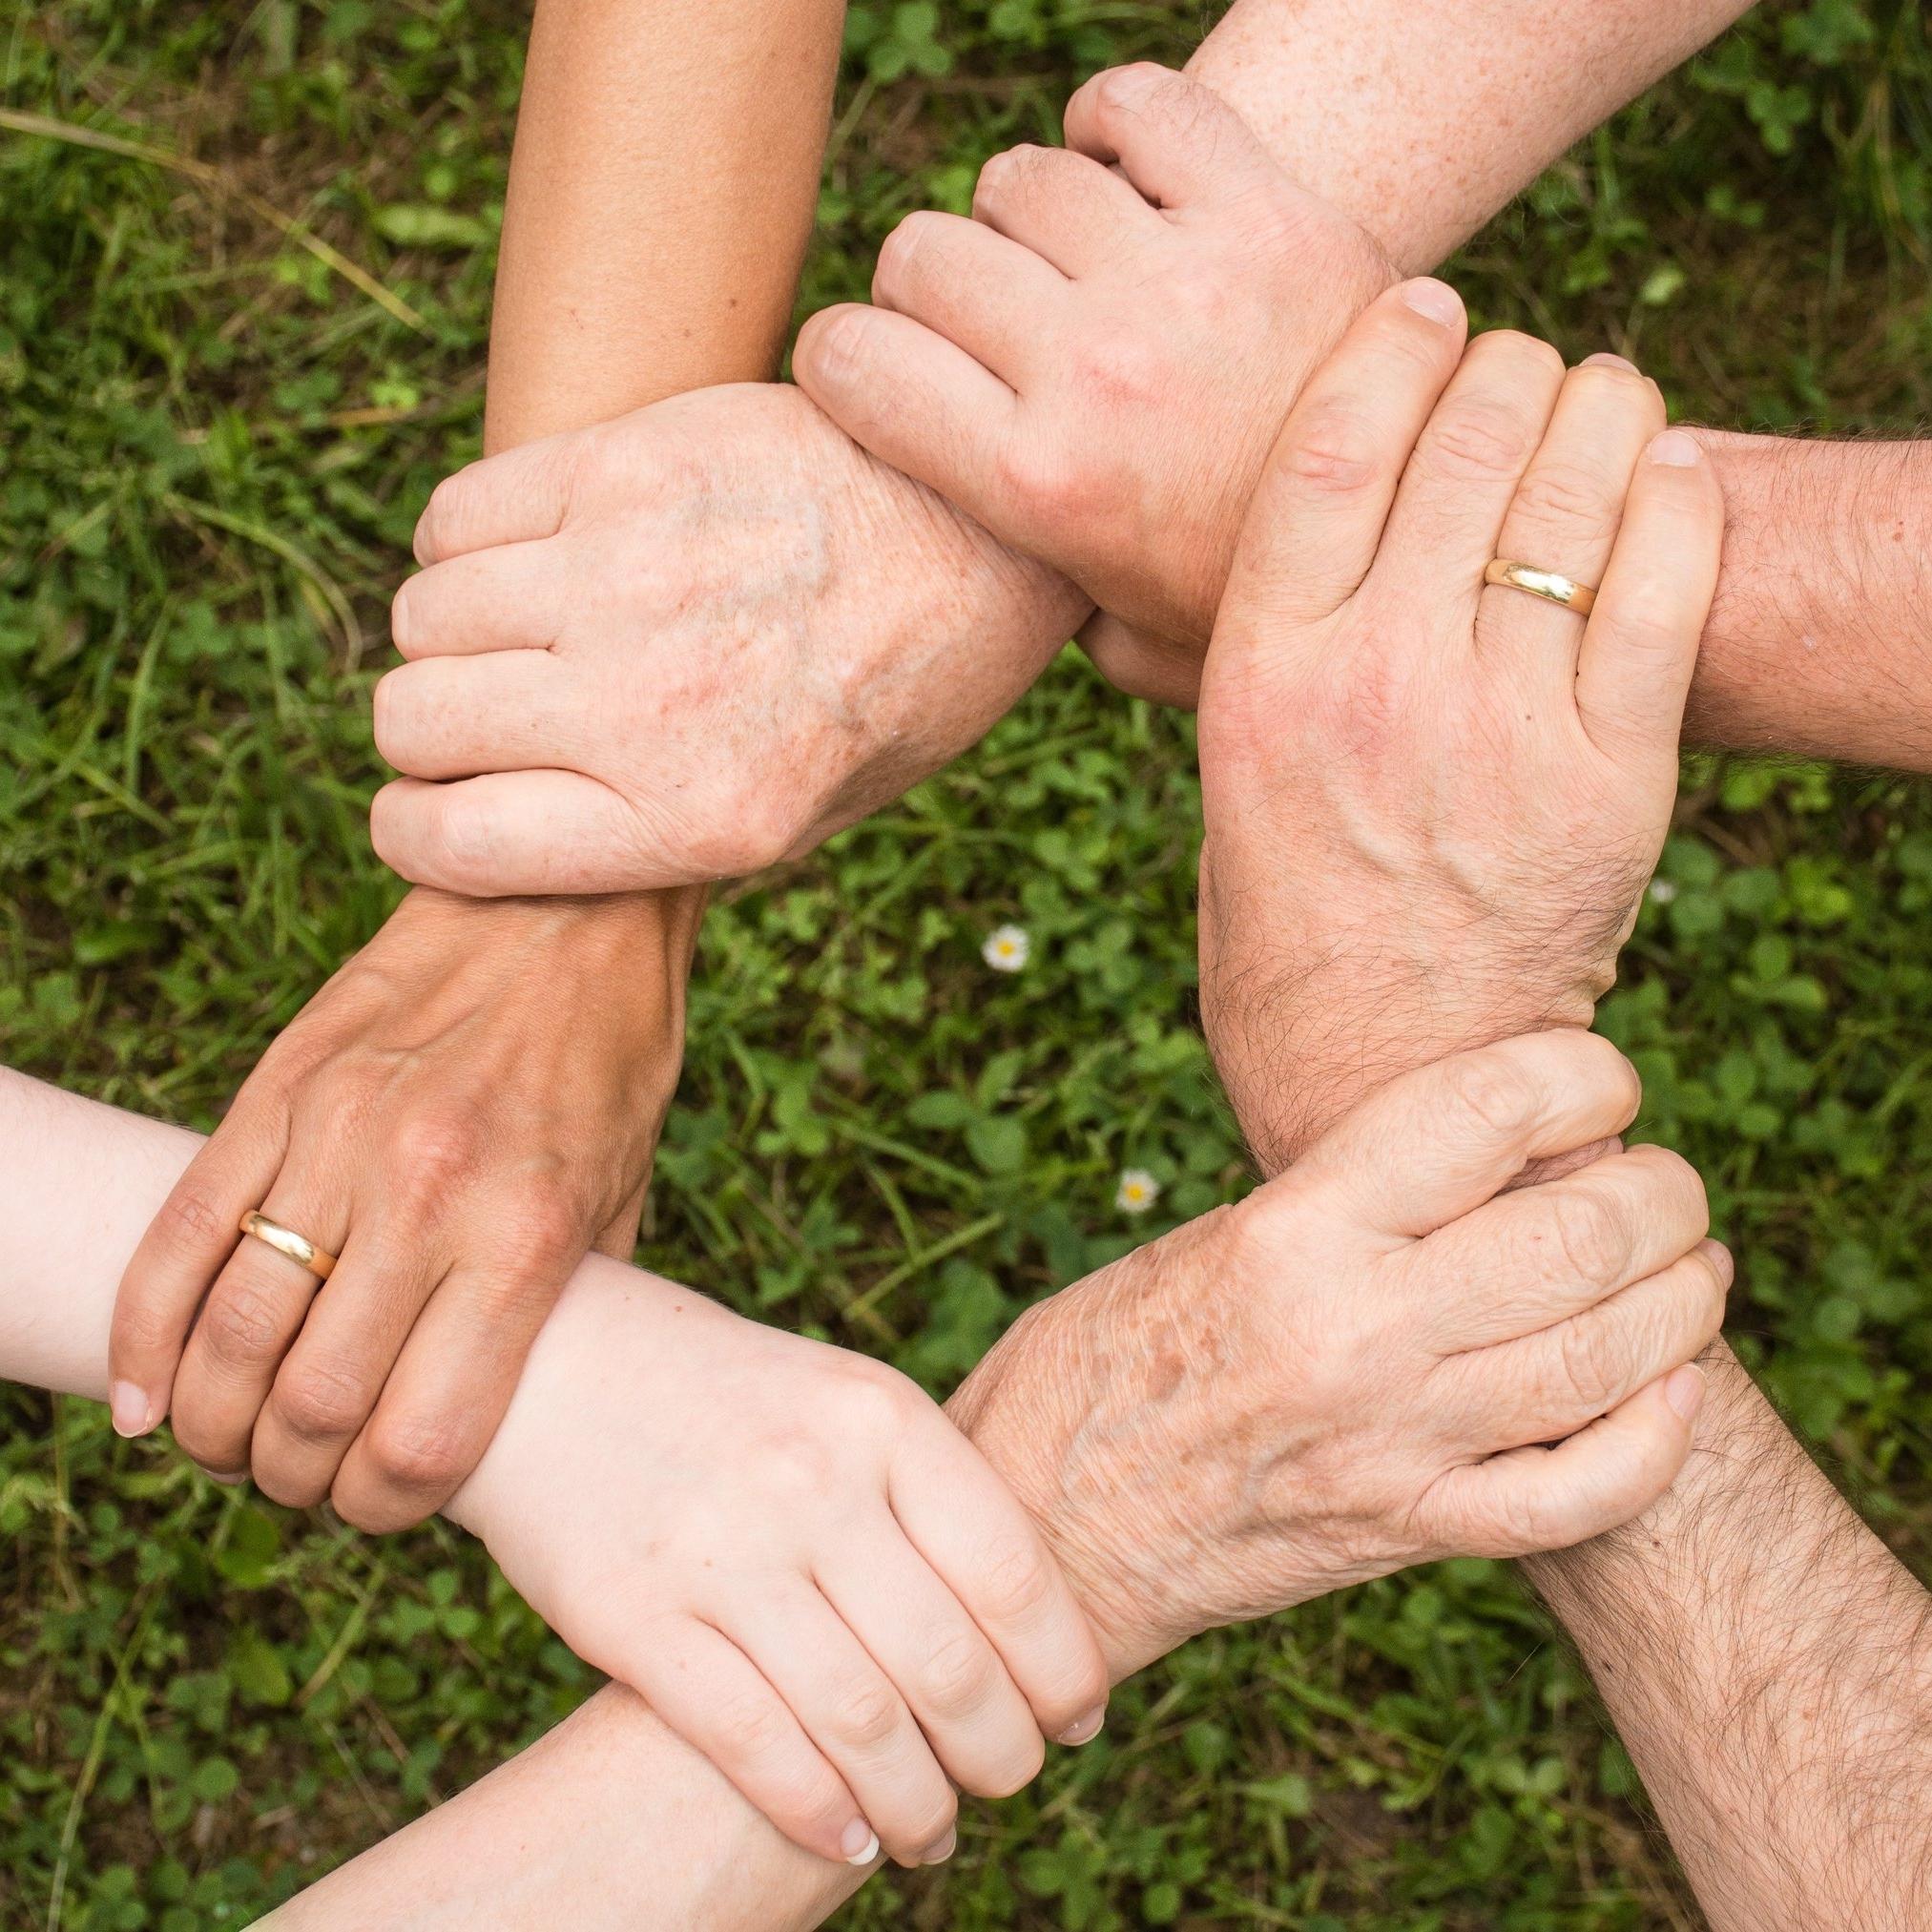 collaboration-community-cooperation-461049.jpg